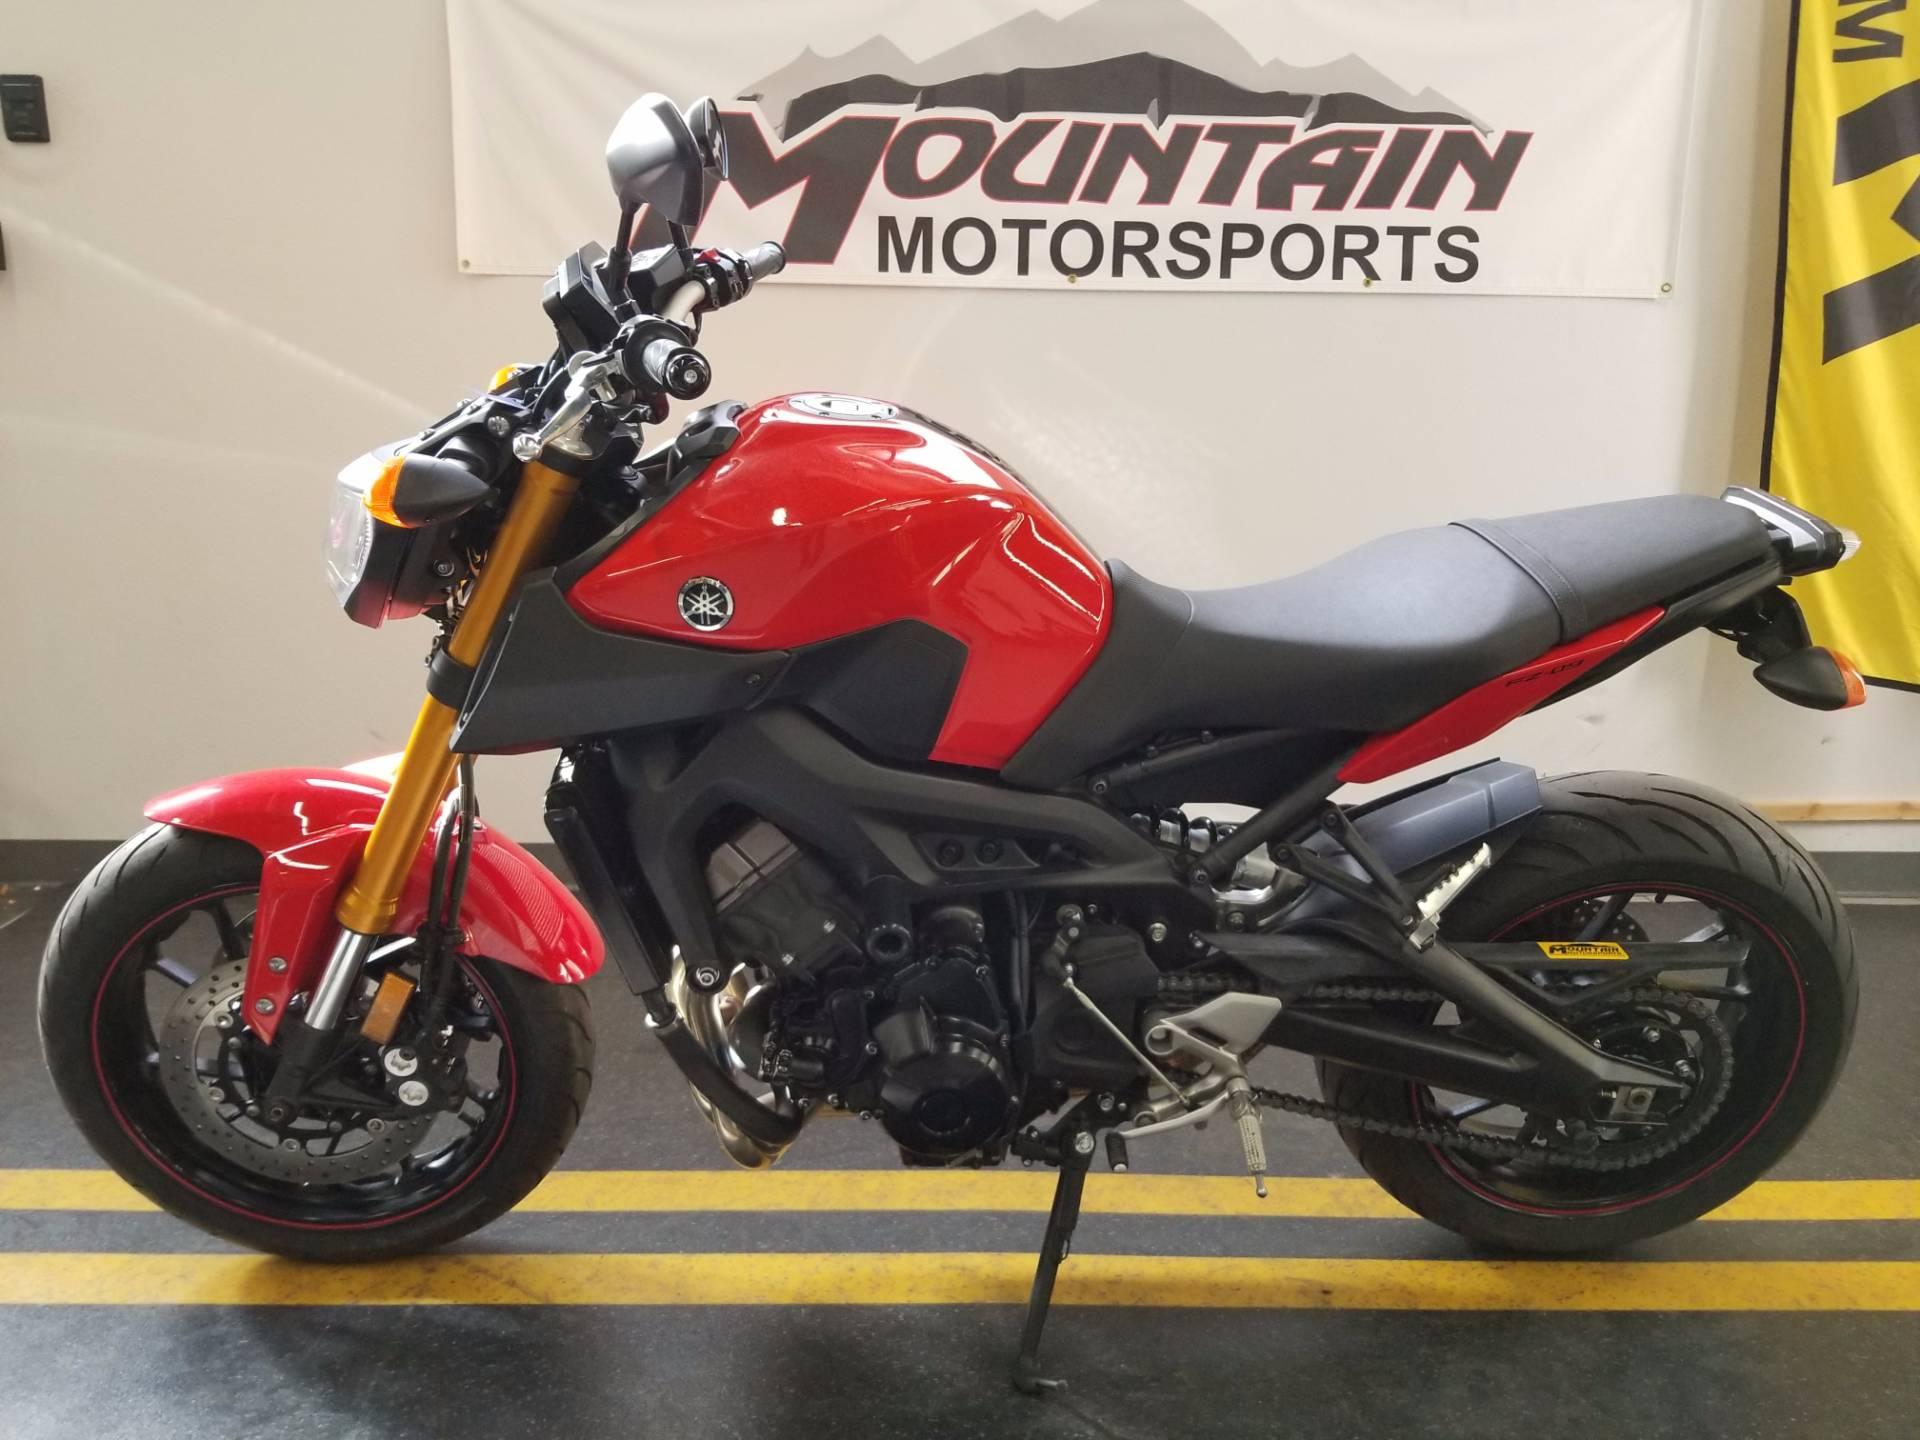 2014 Yamaha FZ-09 for sale 90456